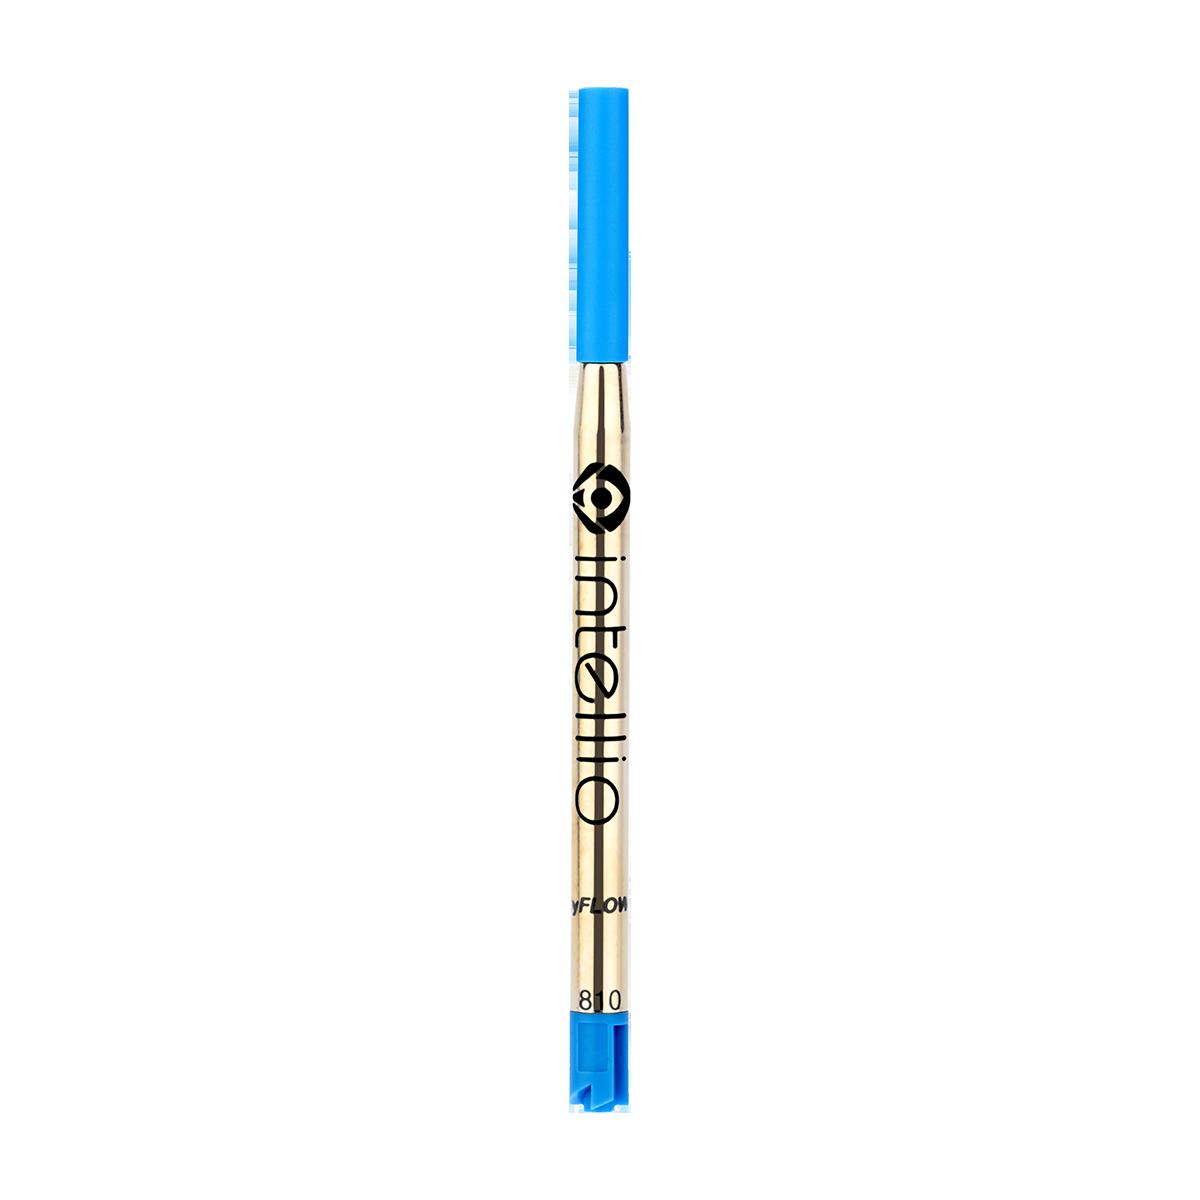 Intellio easyflow - Blue